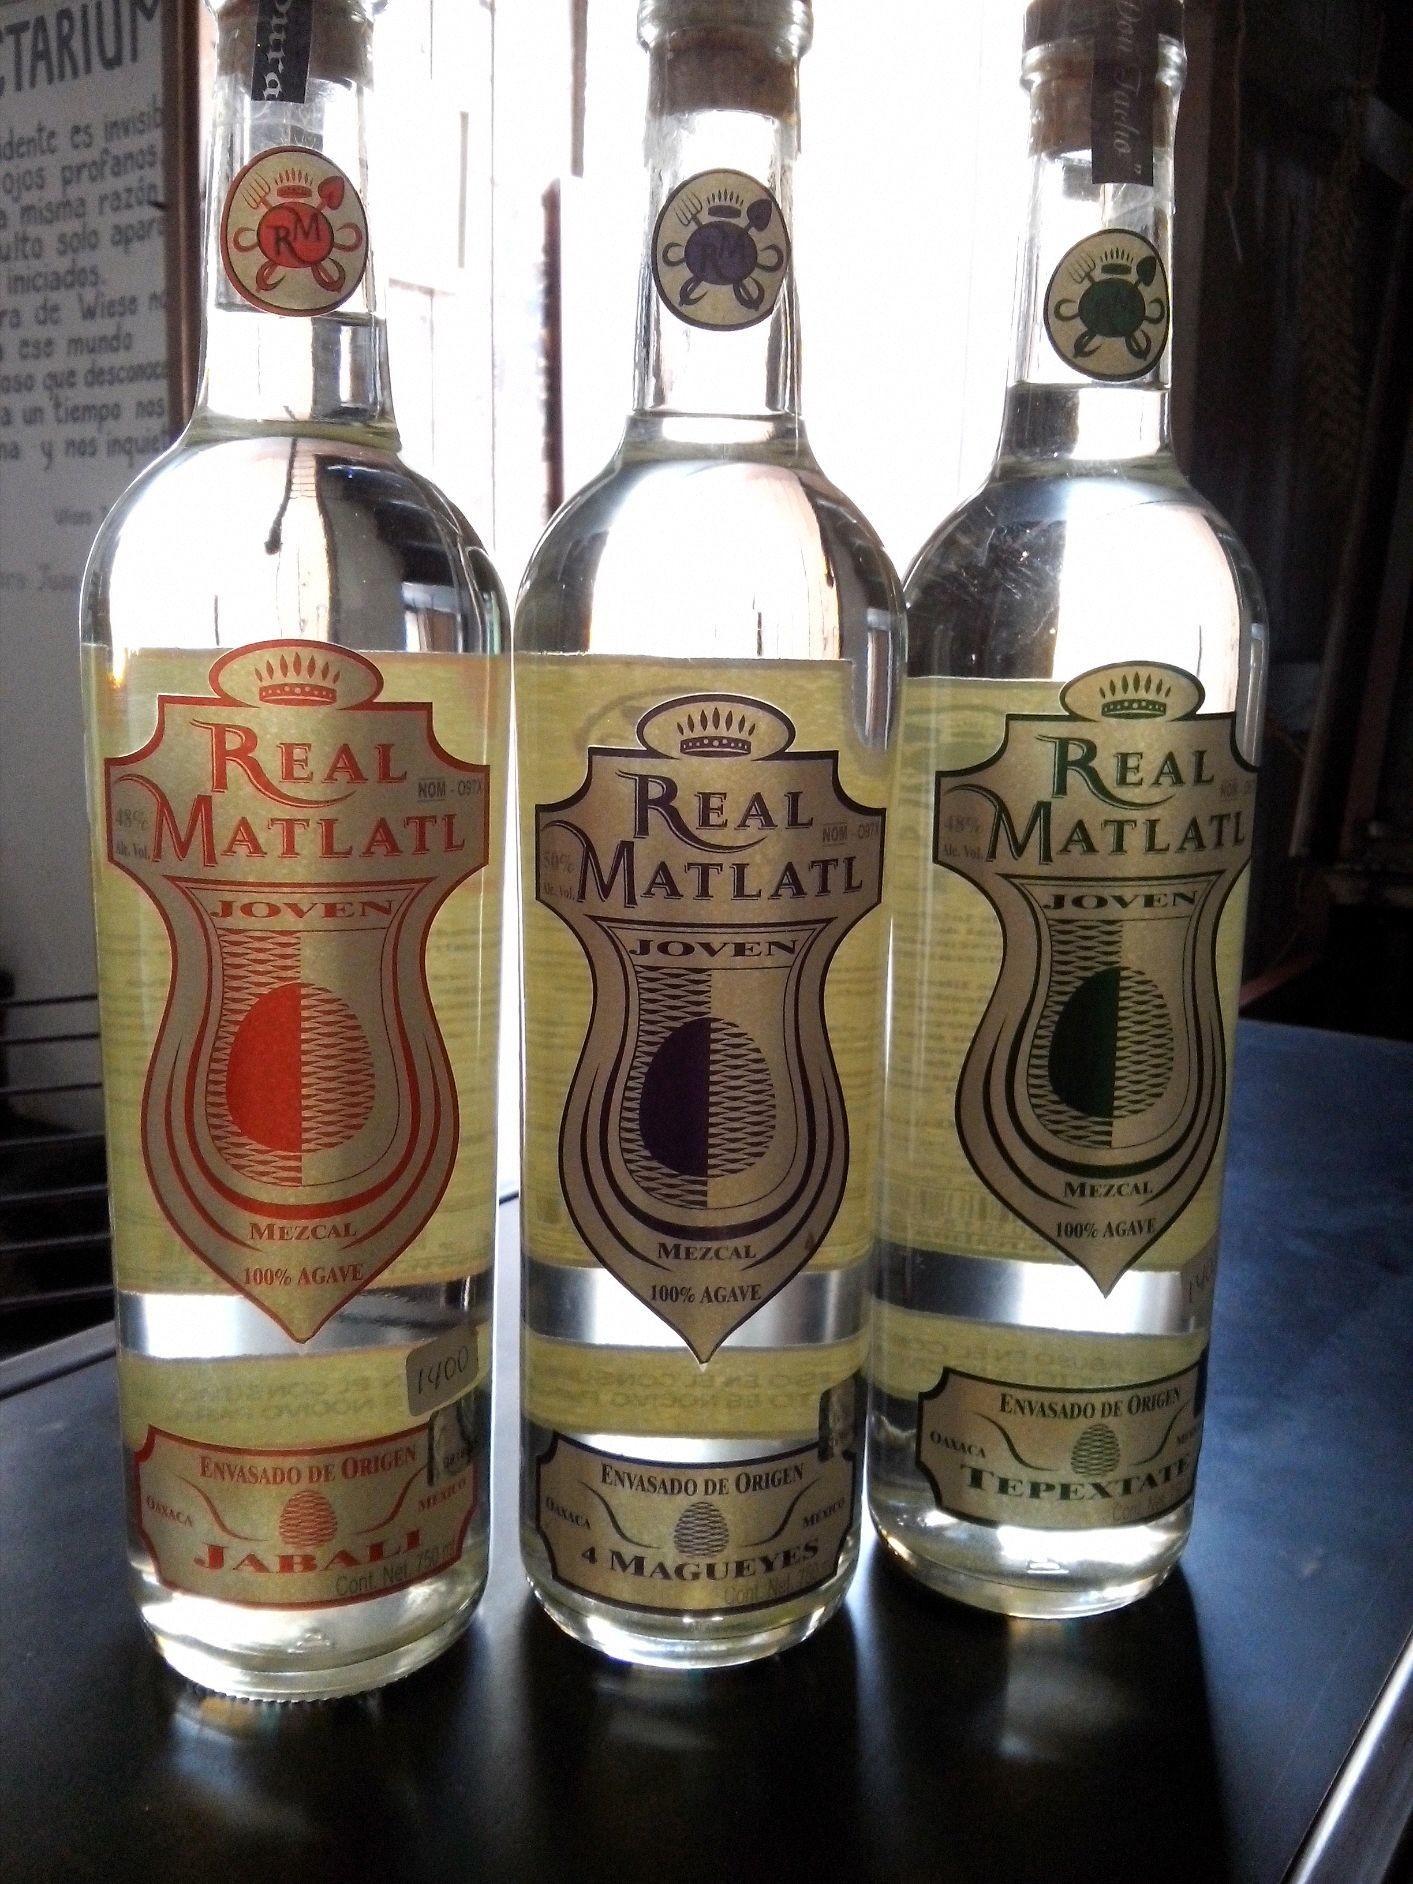 Prueba lo nuevo se Real Matatl. 4 magueyes, jabalí,Tepextate. A la.venta en In Situ.